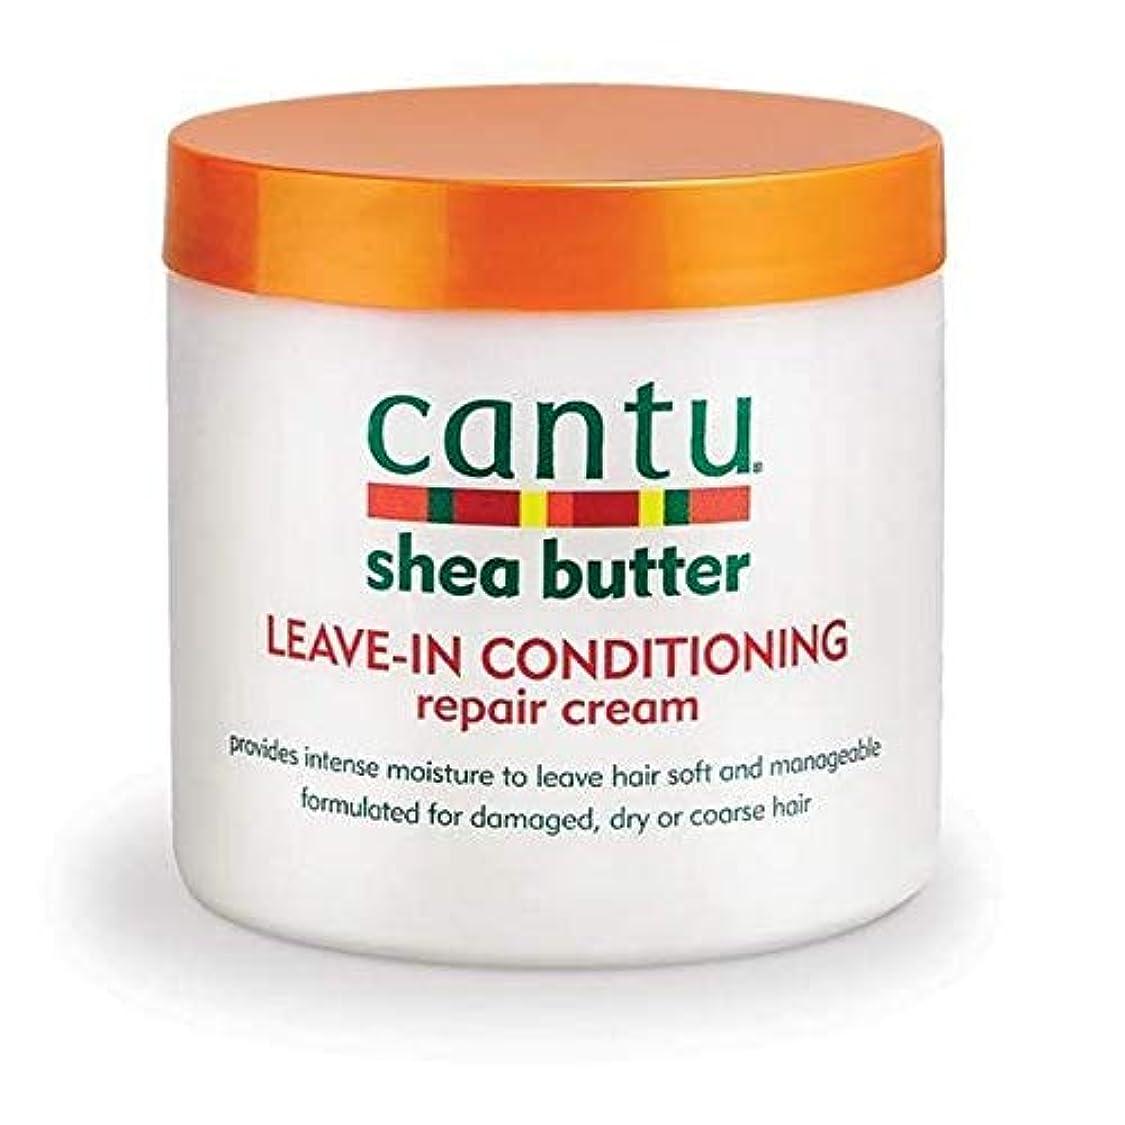 [Cantu ] エアコン修理クリーム453グラムでカントゥシアバター休暇 - Cantu Shea Butter Leave in Conditioning Repair Cream 453g [並行輸入品]